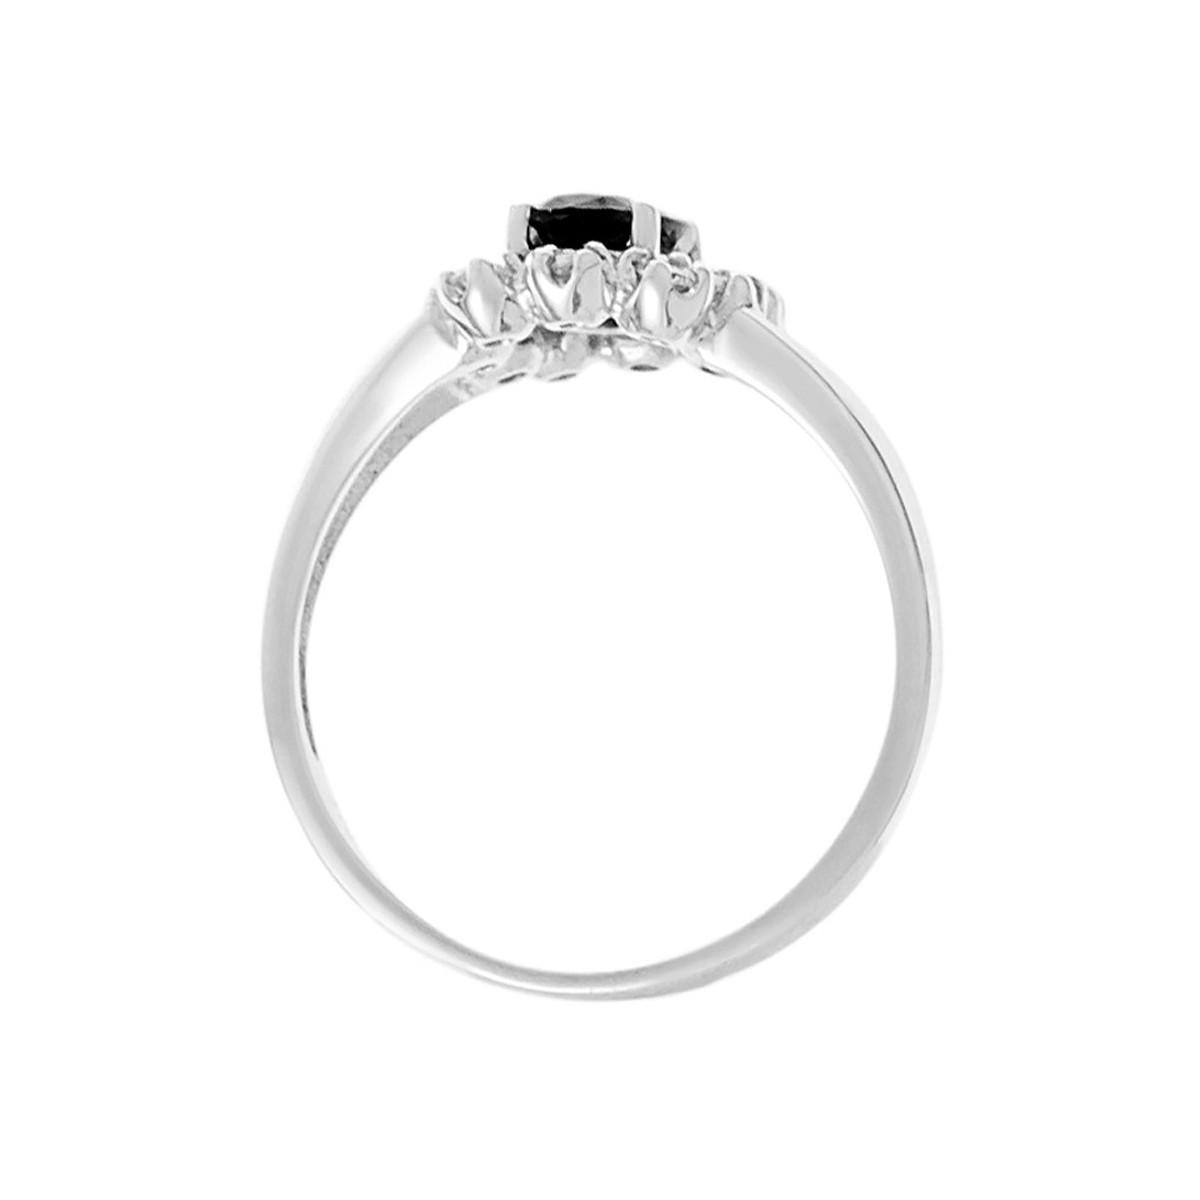 "Bague Or Blanc et Diamants 0,21 carat et Saphir 1 carat ""BAHIA"""